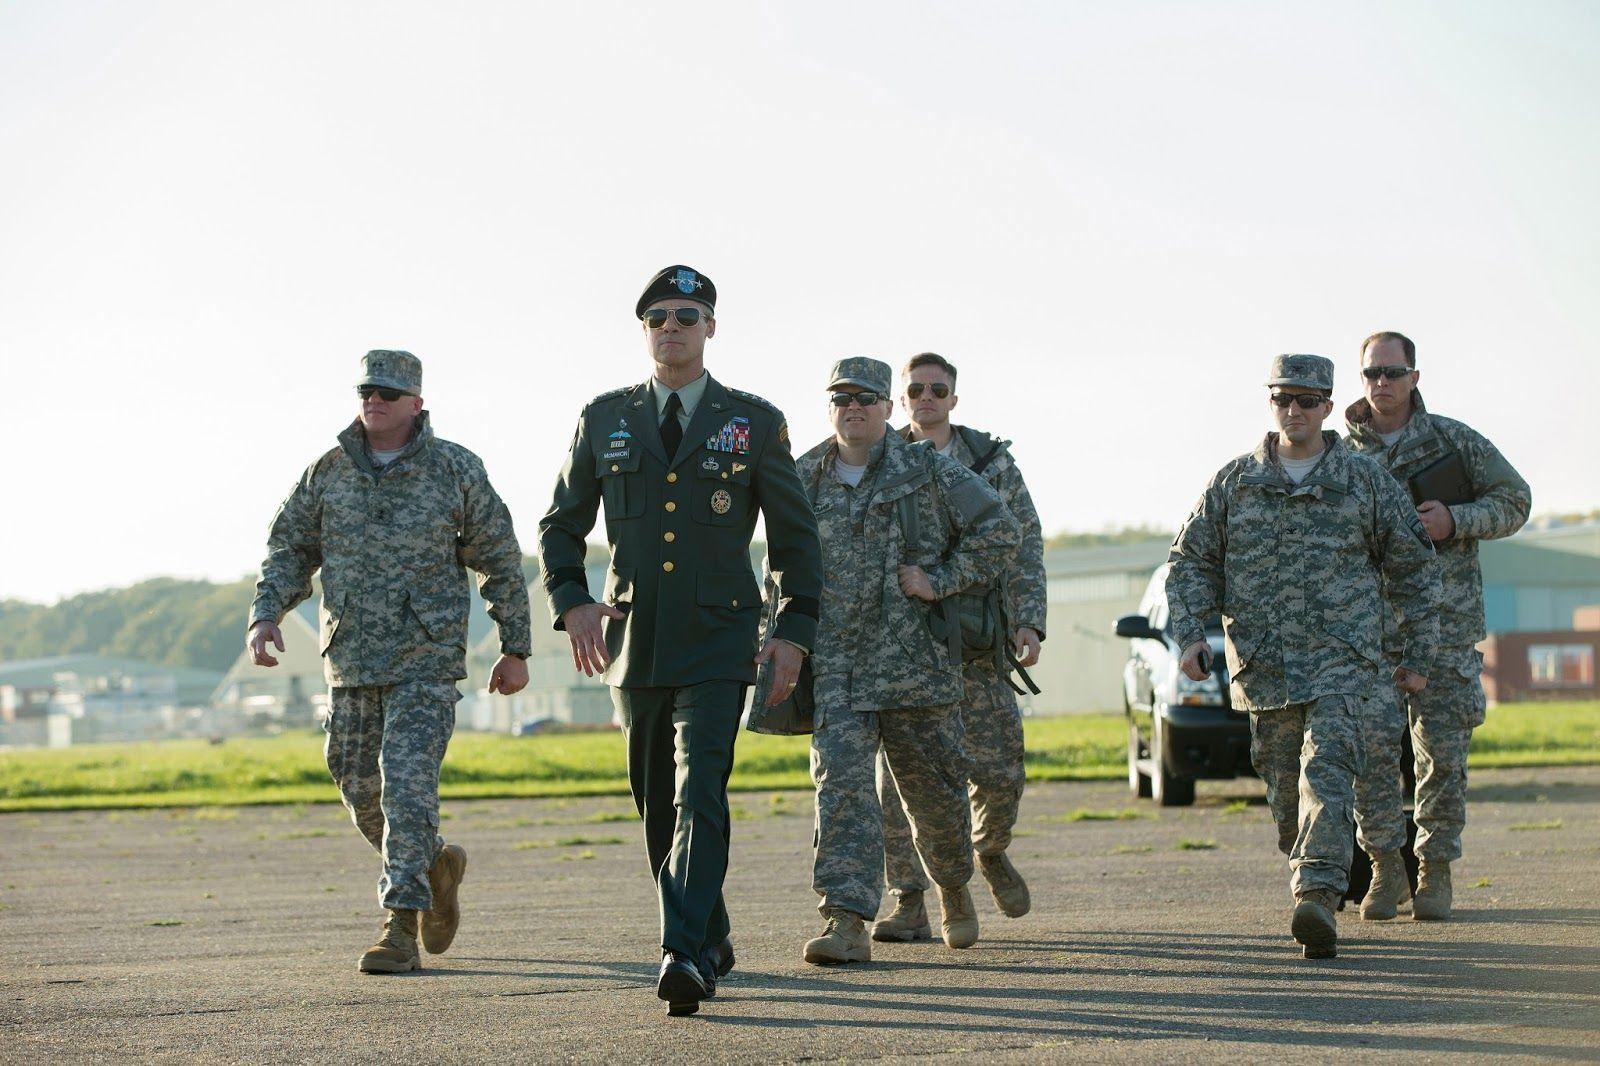 War Machine Brad Pitt Películas De Brad Pitt Brad Pitt Nuevas Películas